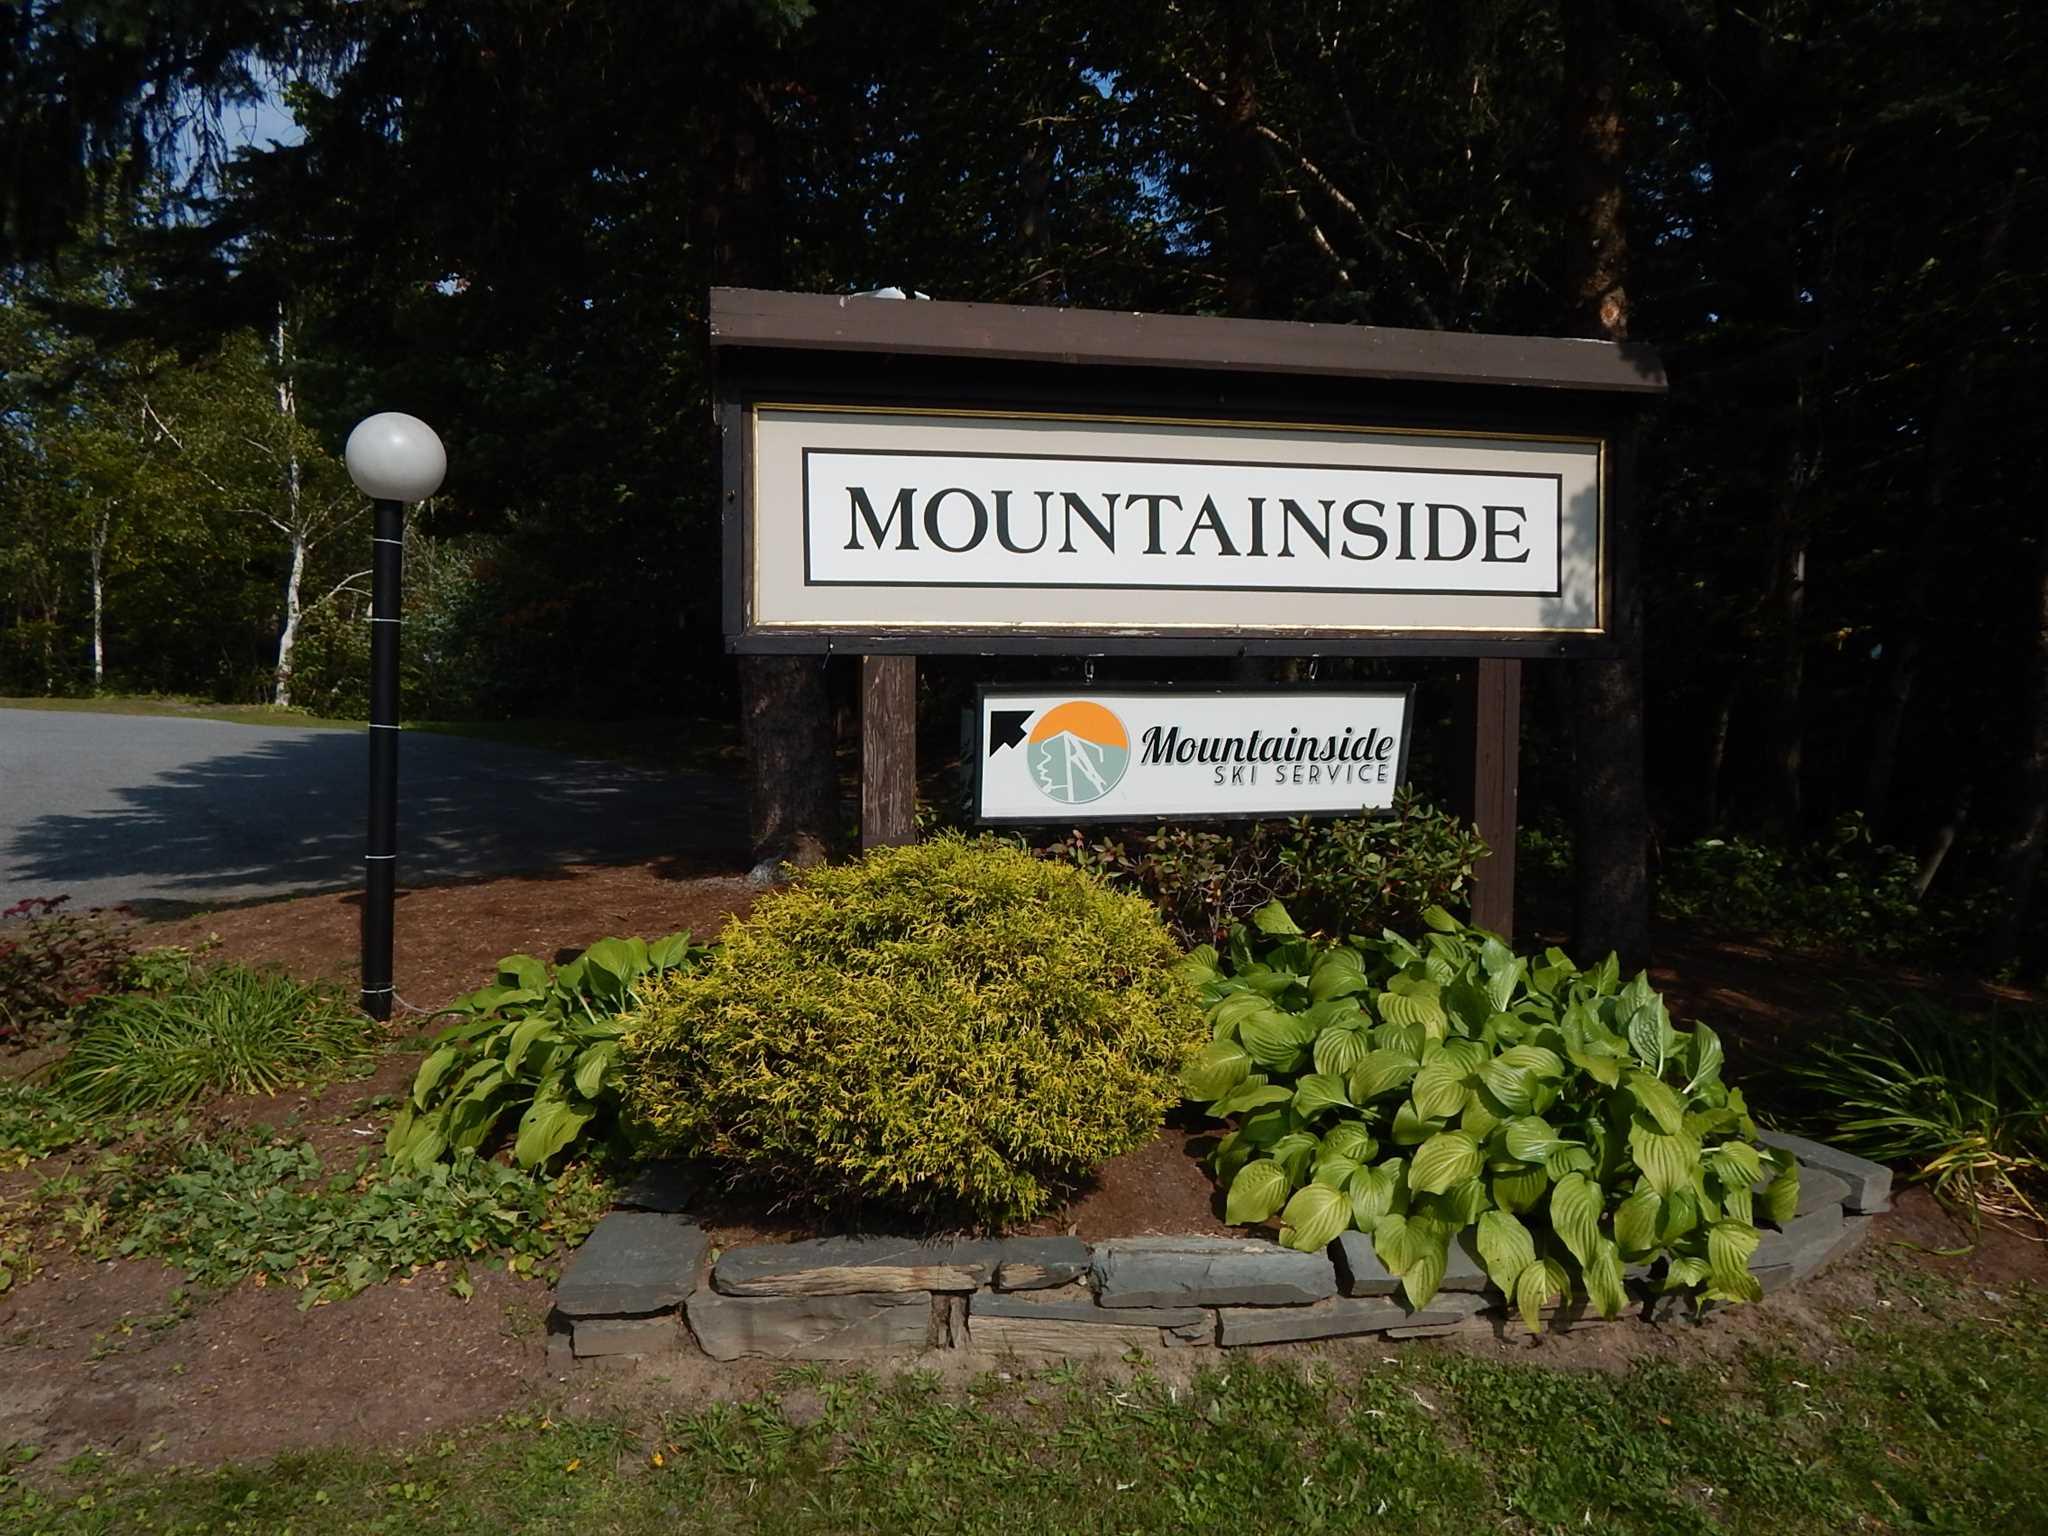 251 Mountainside